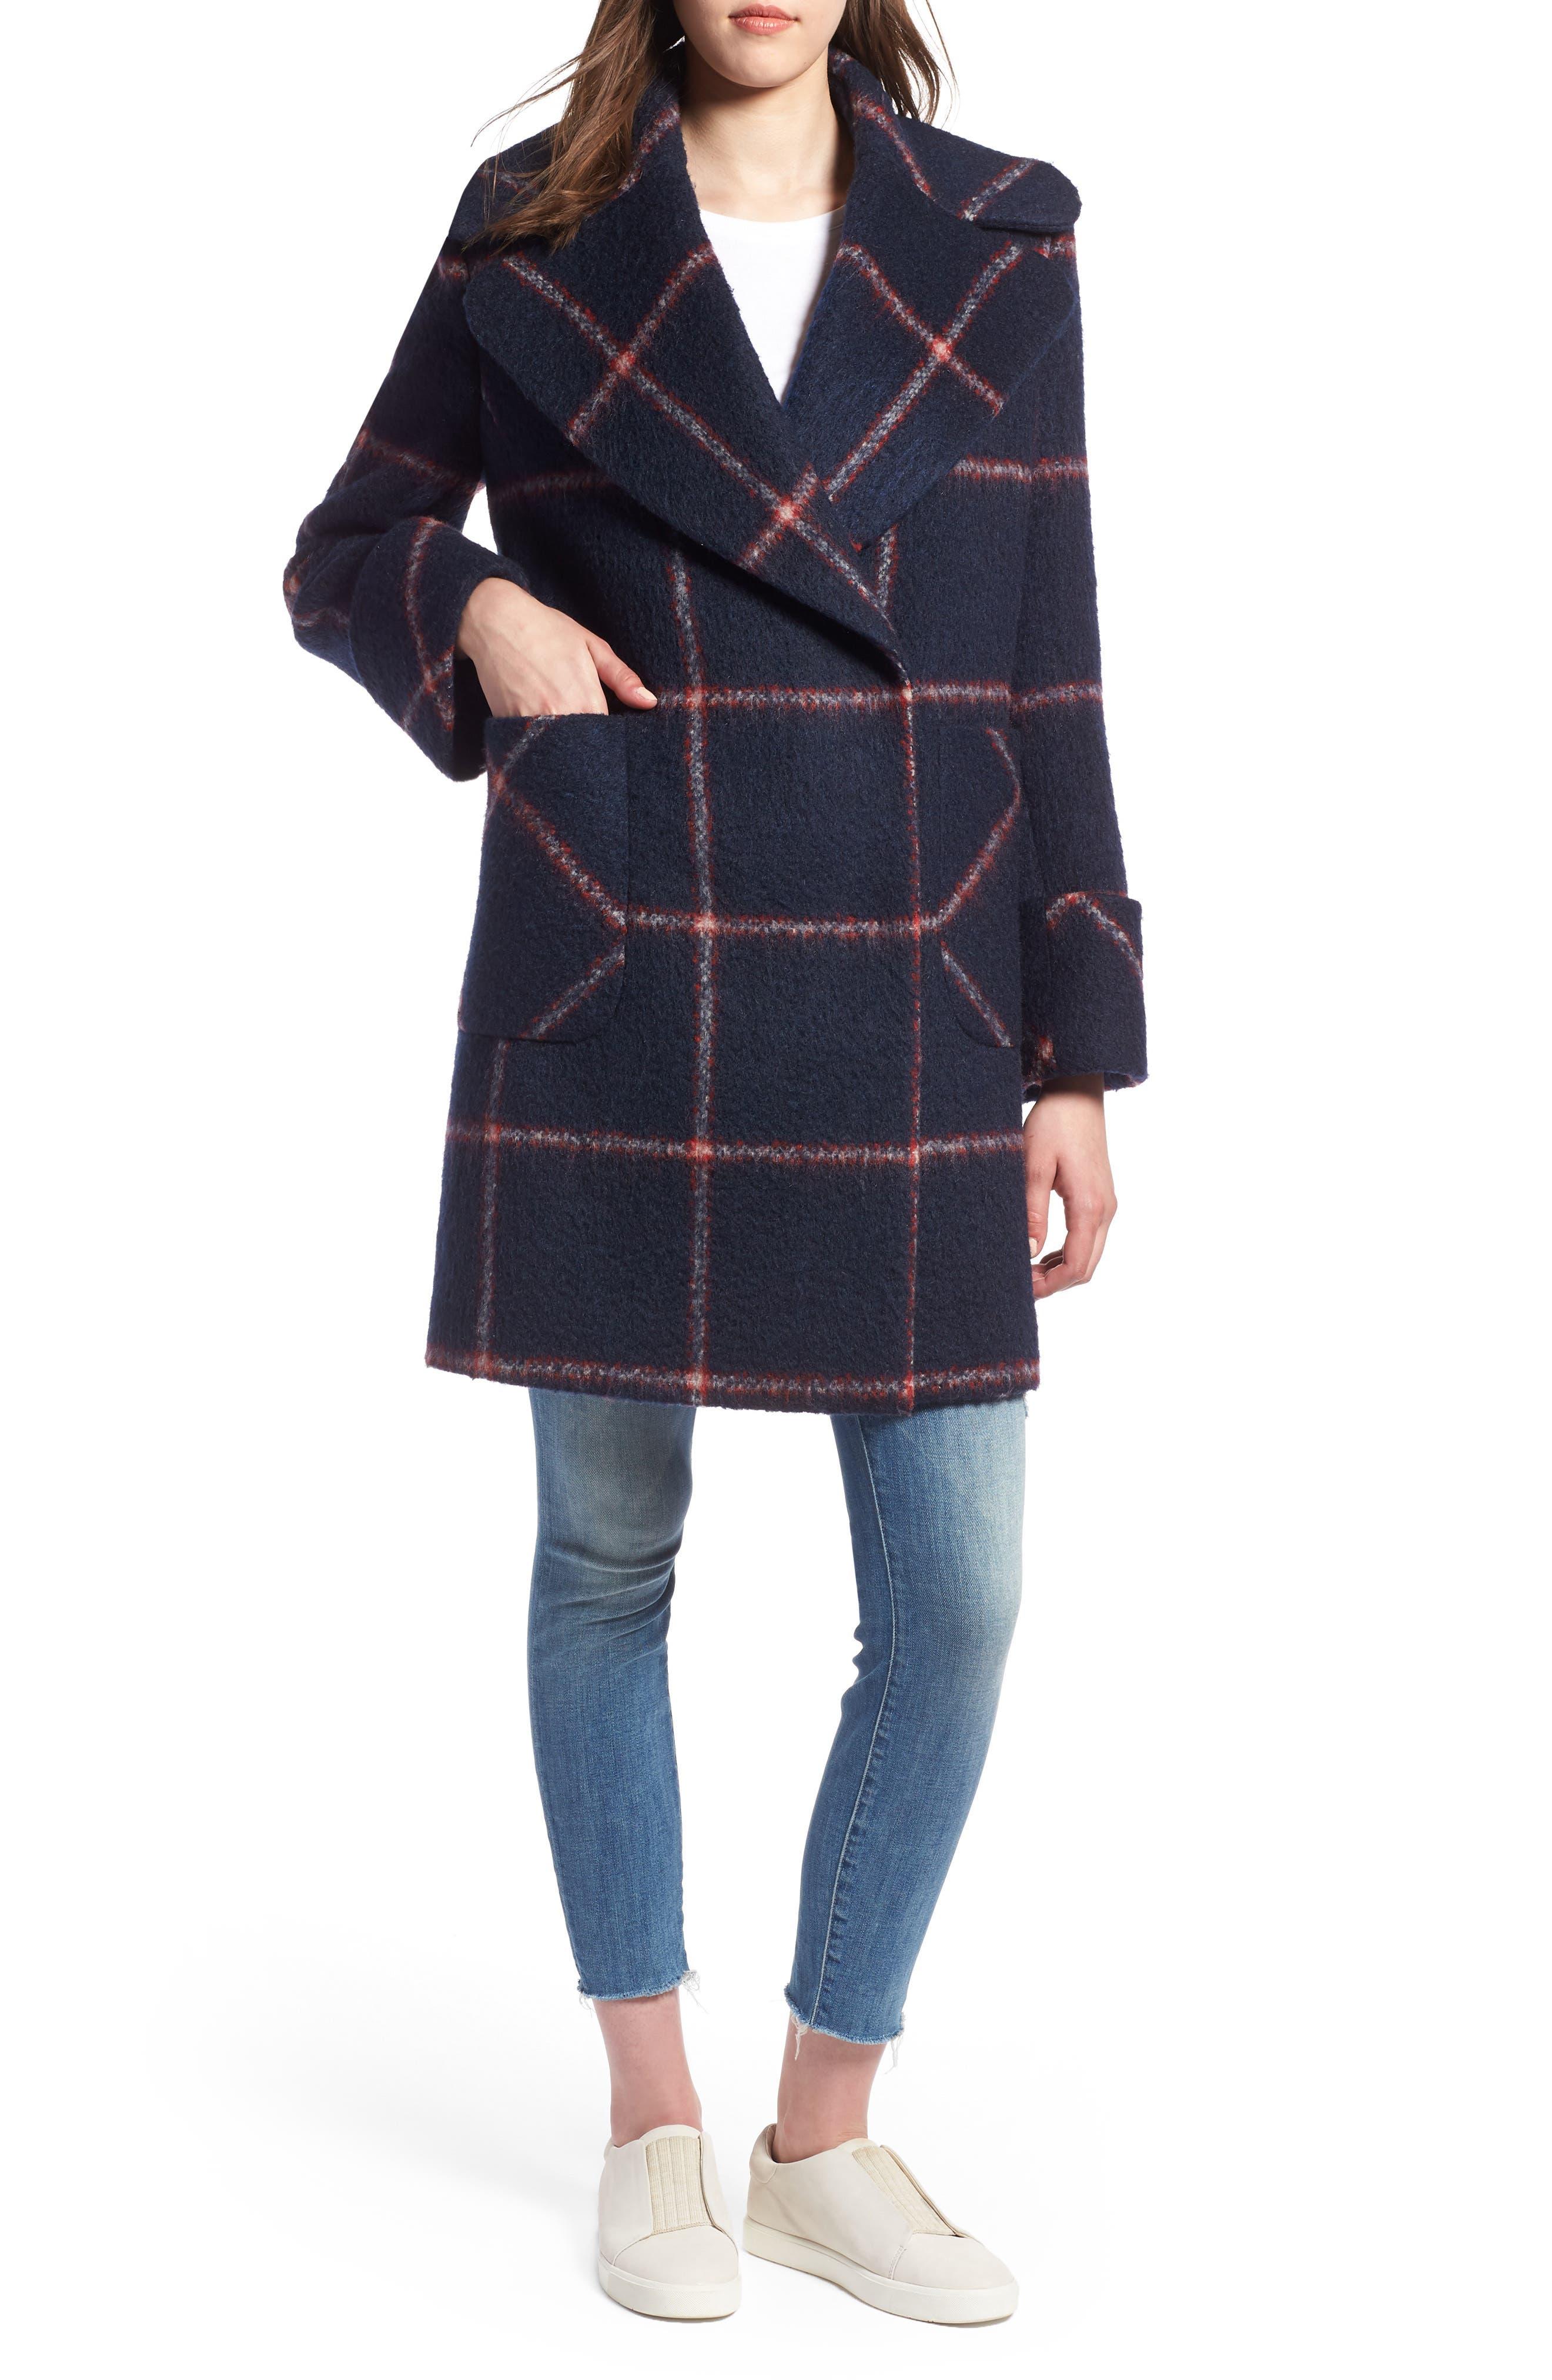 KENDALL + KYLIE, Oversize Collar Coat, Main thumbnail 1, color, 427